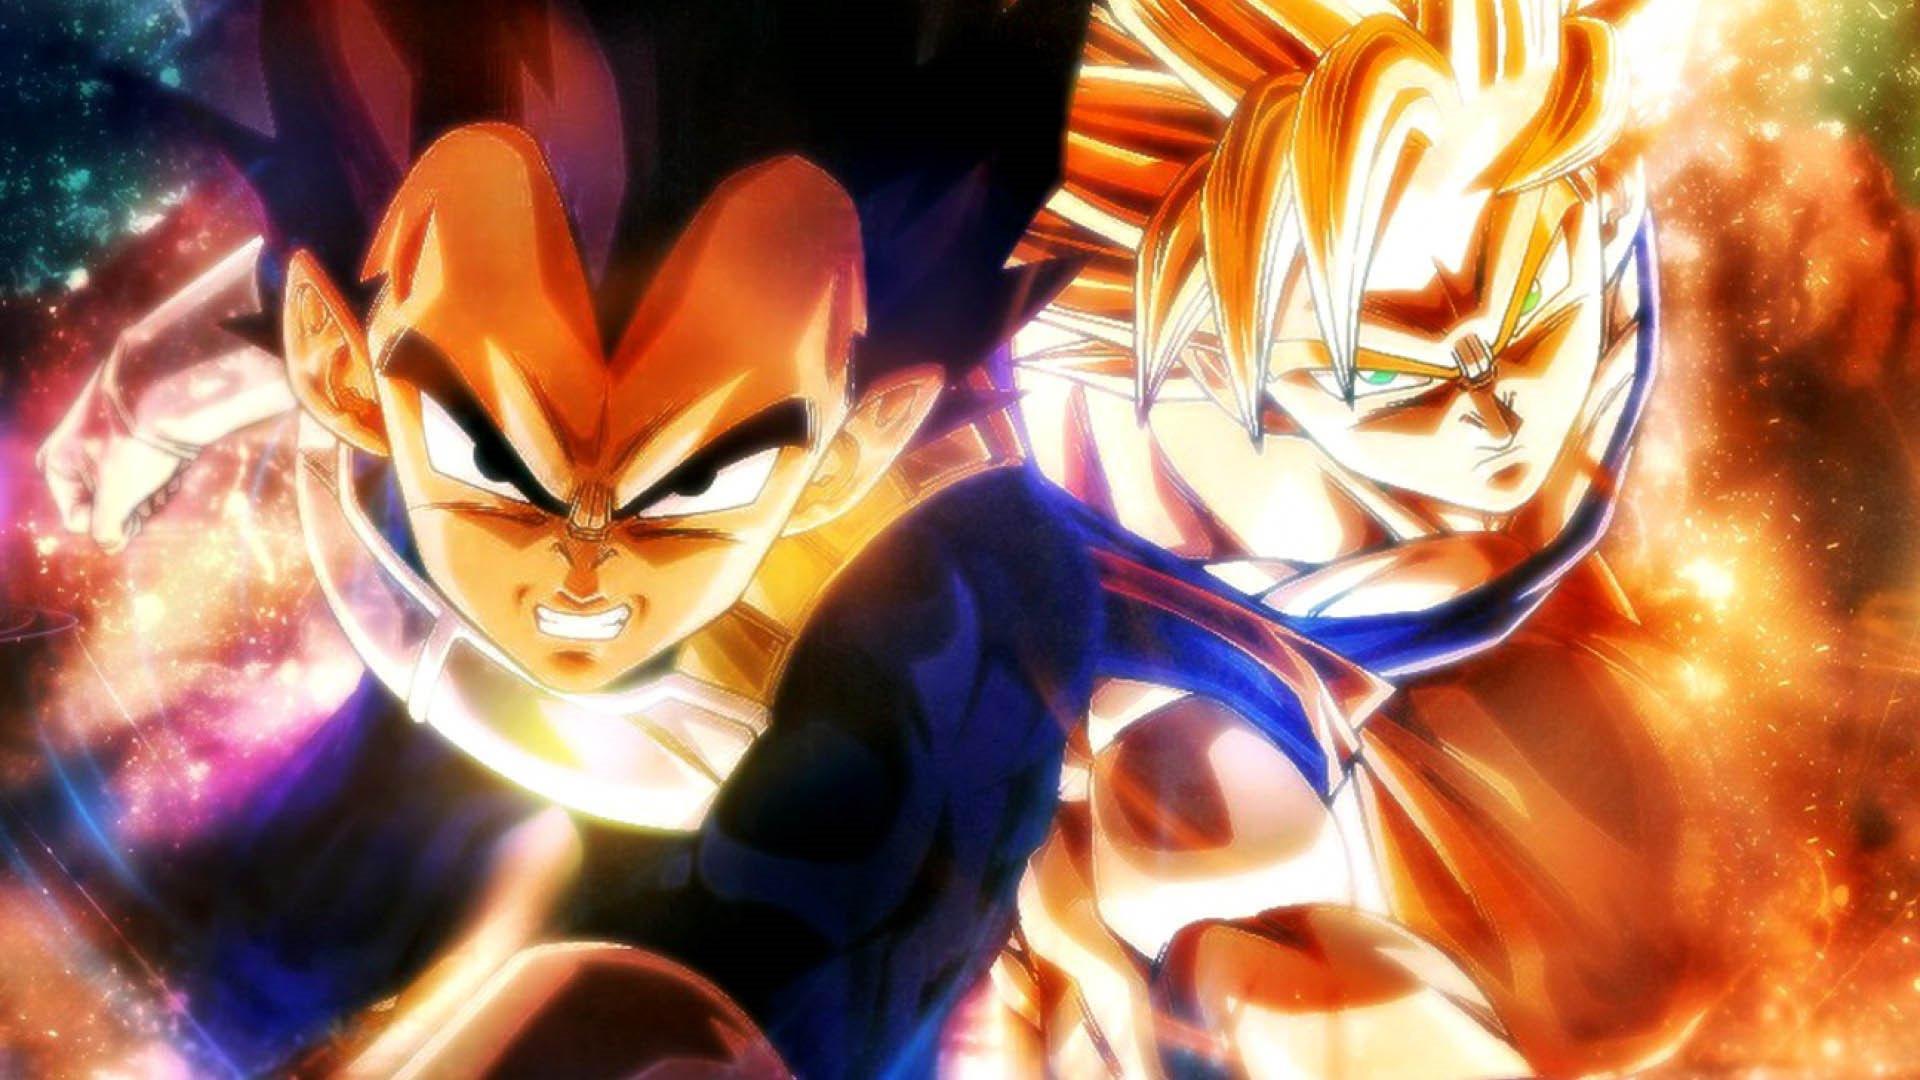 Goku And Vegeta Wallpapers - Wallpaper Cave